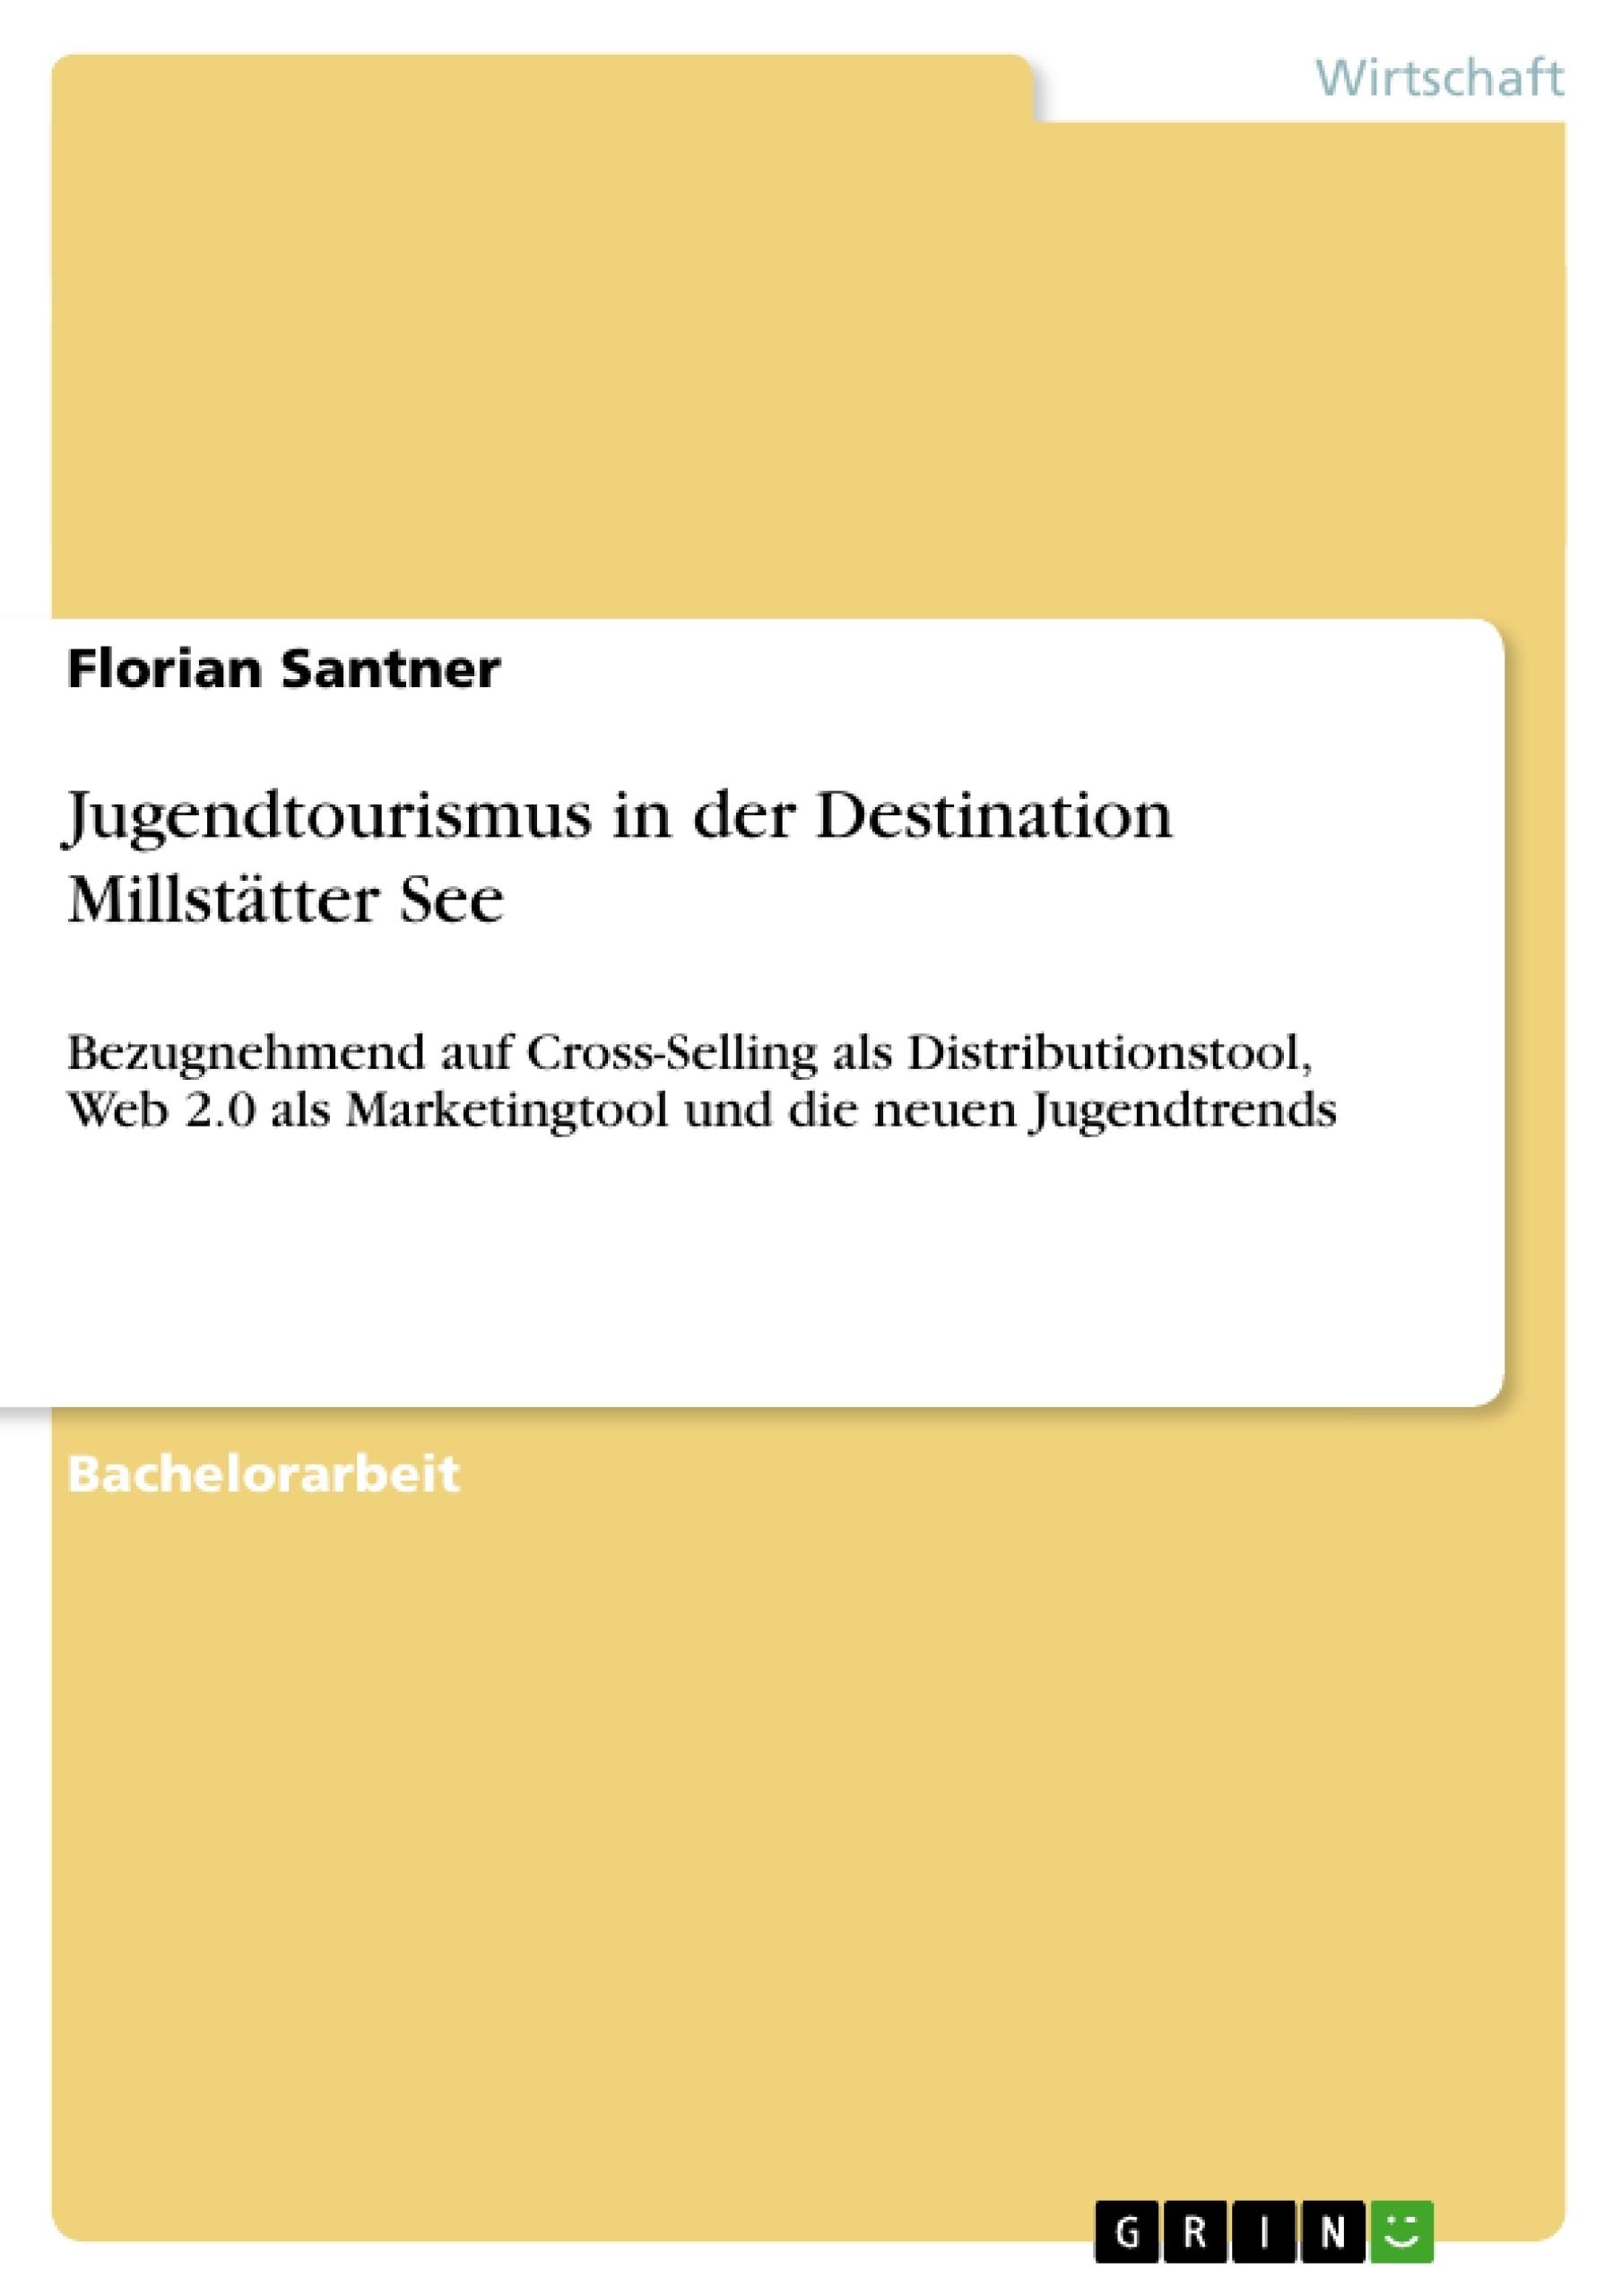 Titel: Jugendtourismus in der Destination Millstätter See